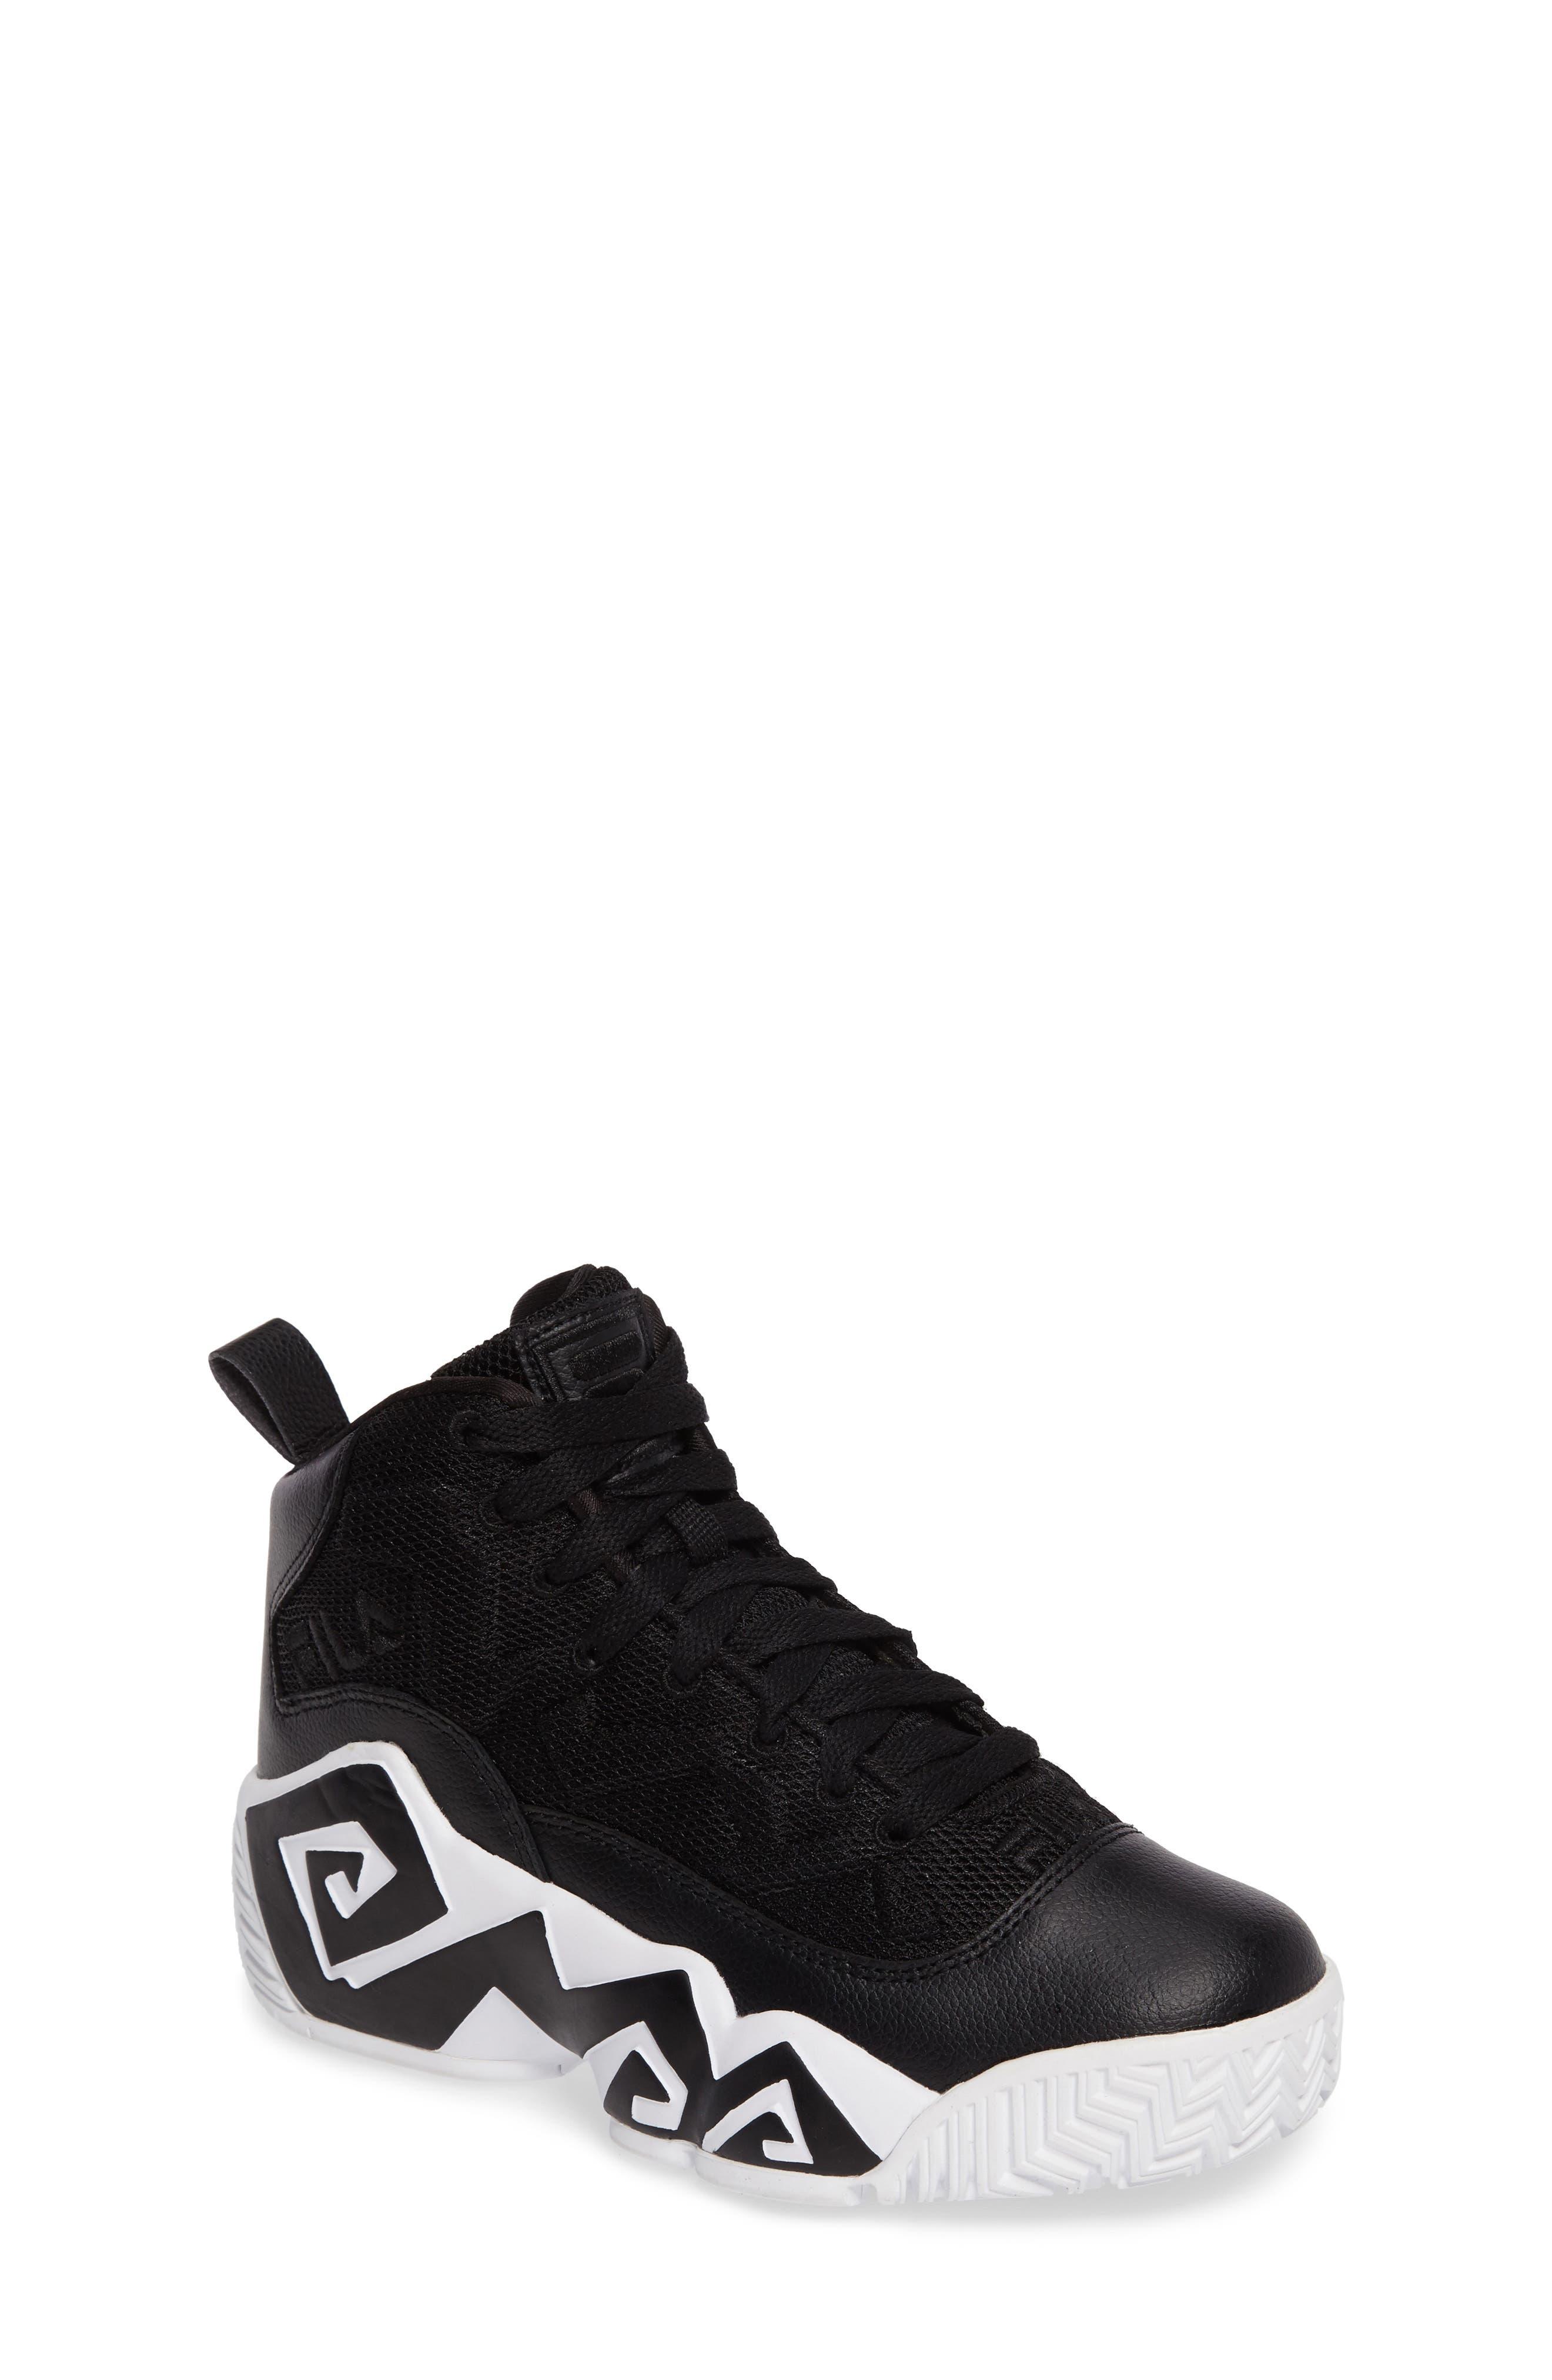 fila kids shoes. main image - fila mb mesh sneaker (big kid) fila kids shoes n